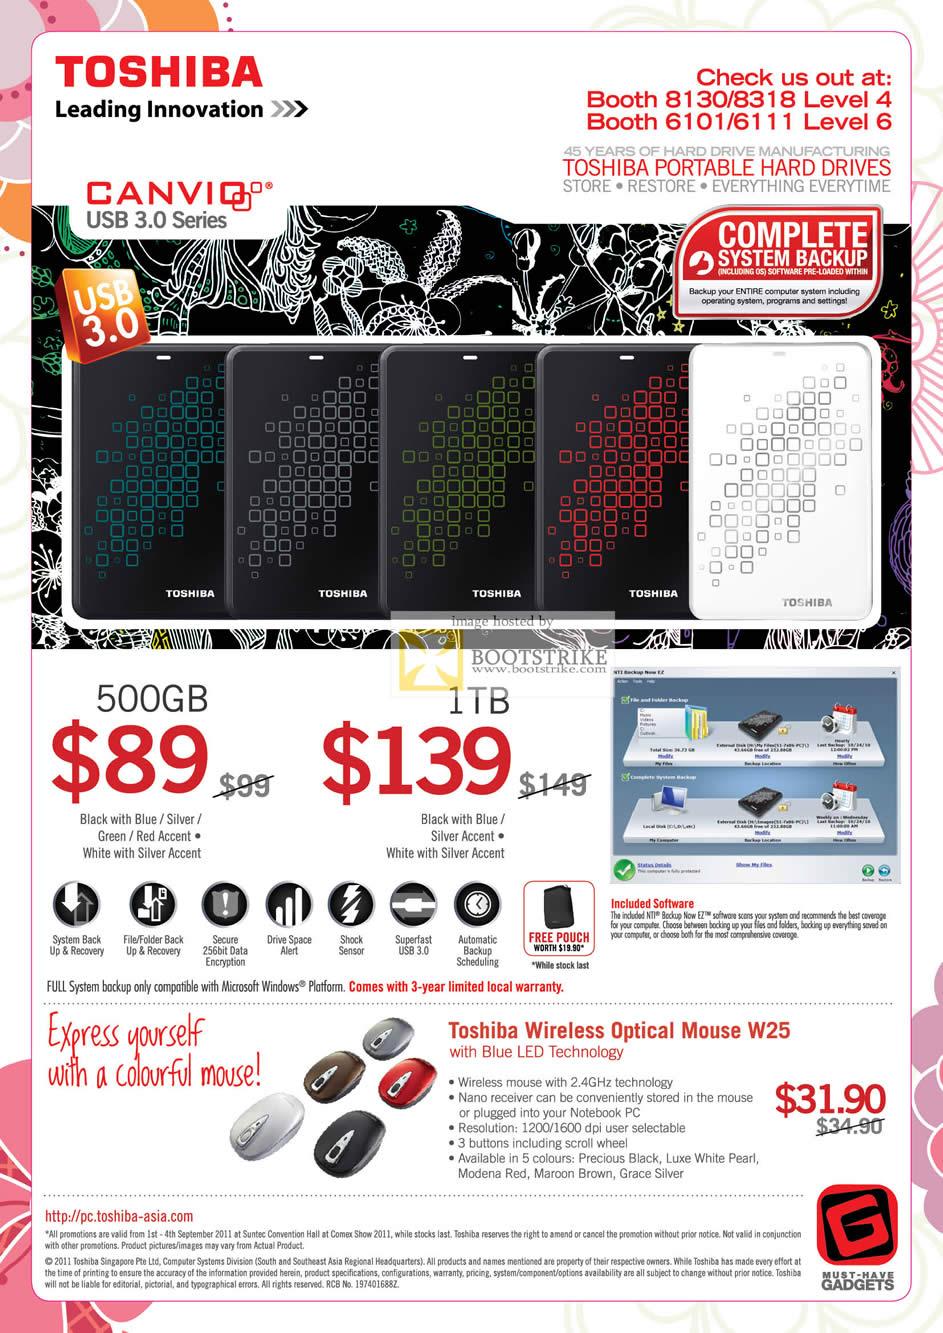 COMEX 2011 price list image brochure of Toshiba External Storage Canvio USB3 500GB 1TB Mouse W25 LED